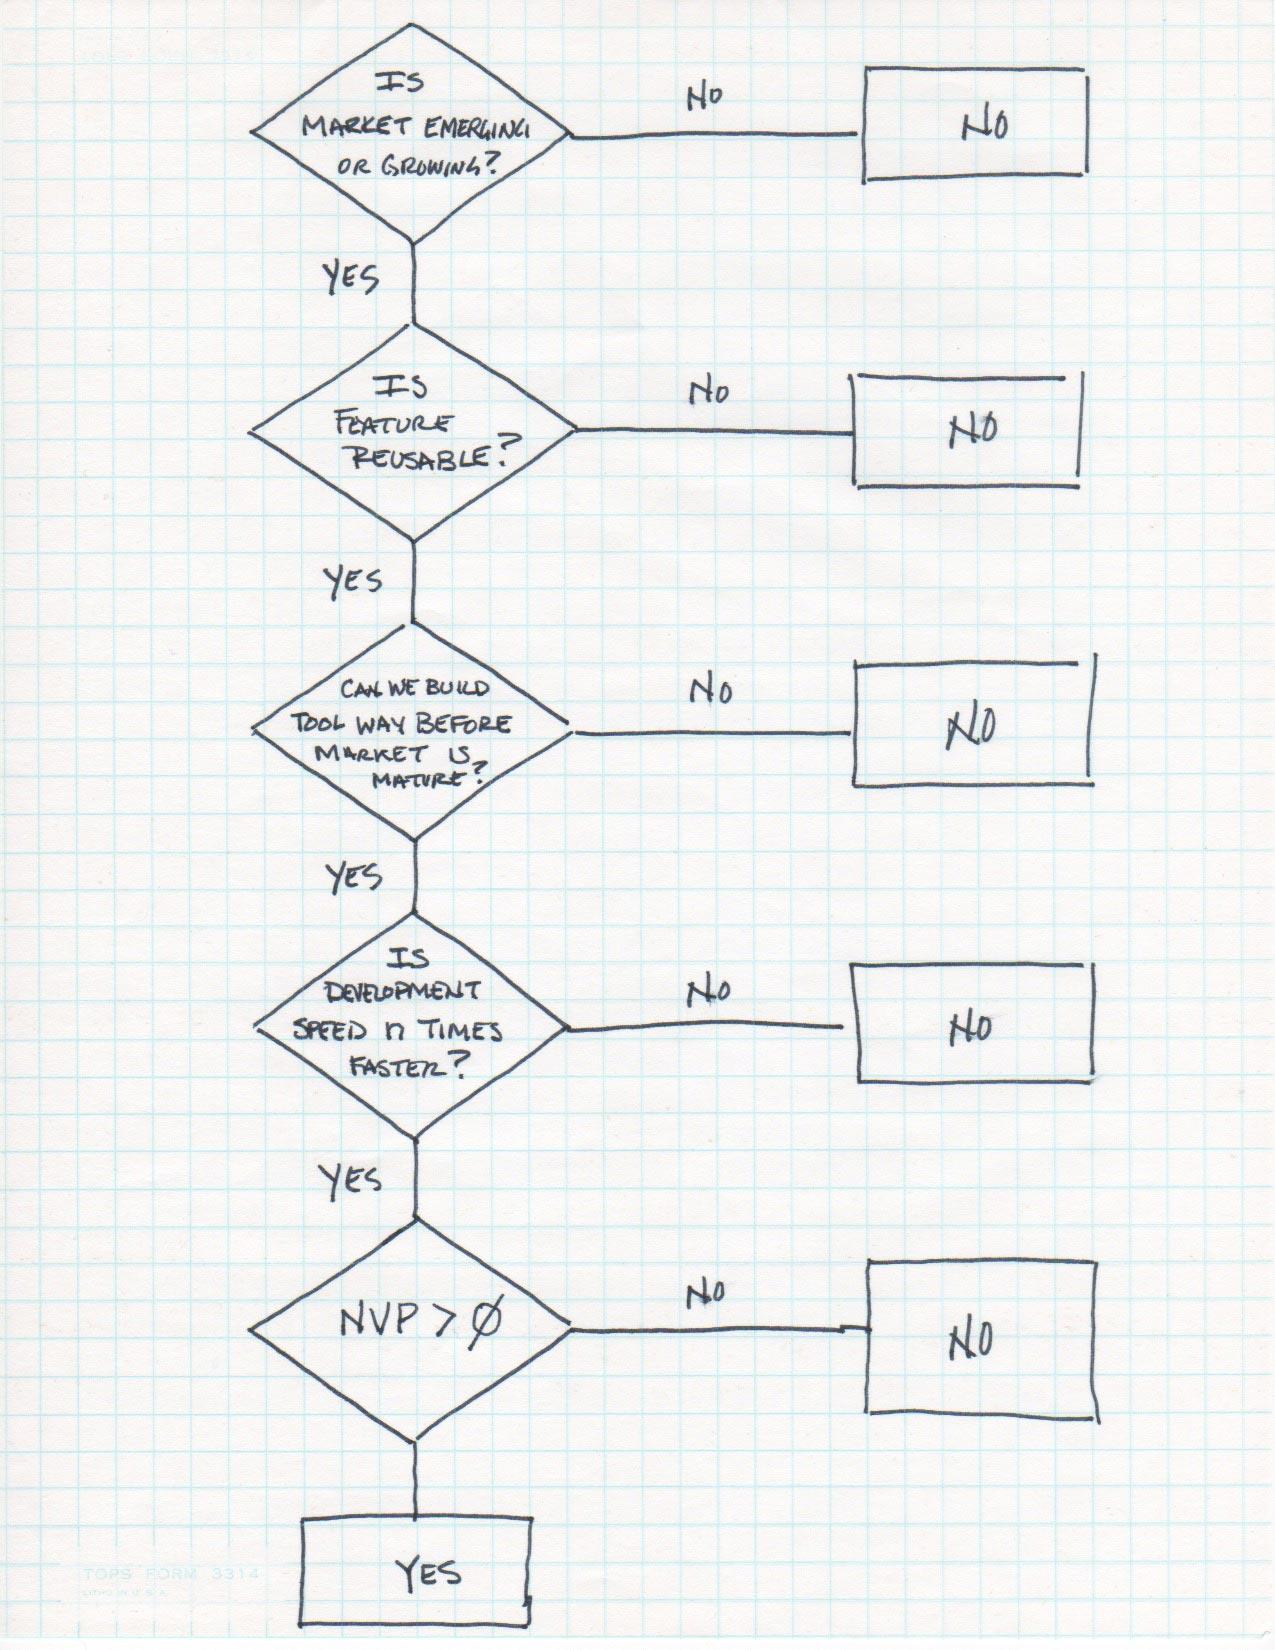 flowchart of decision process